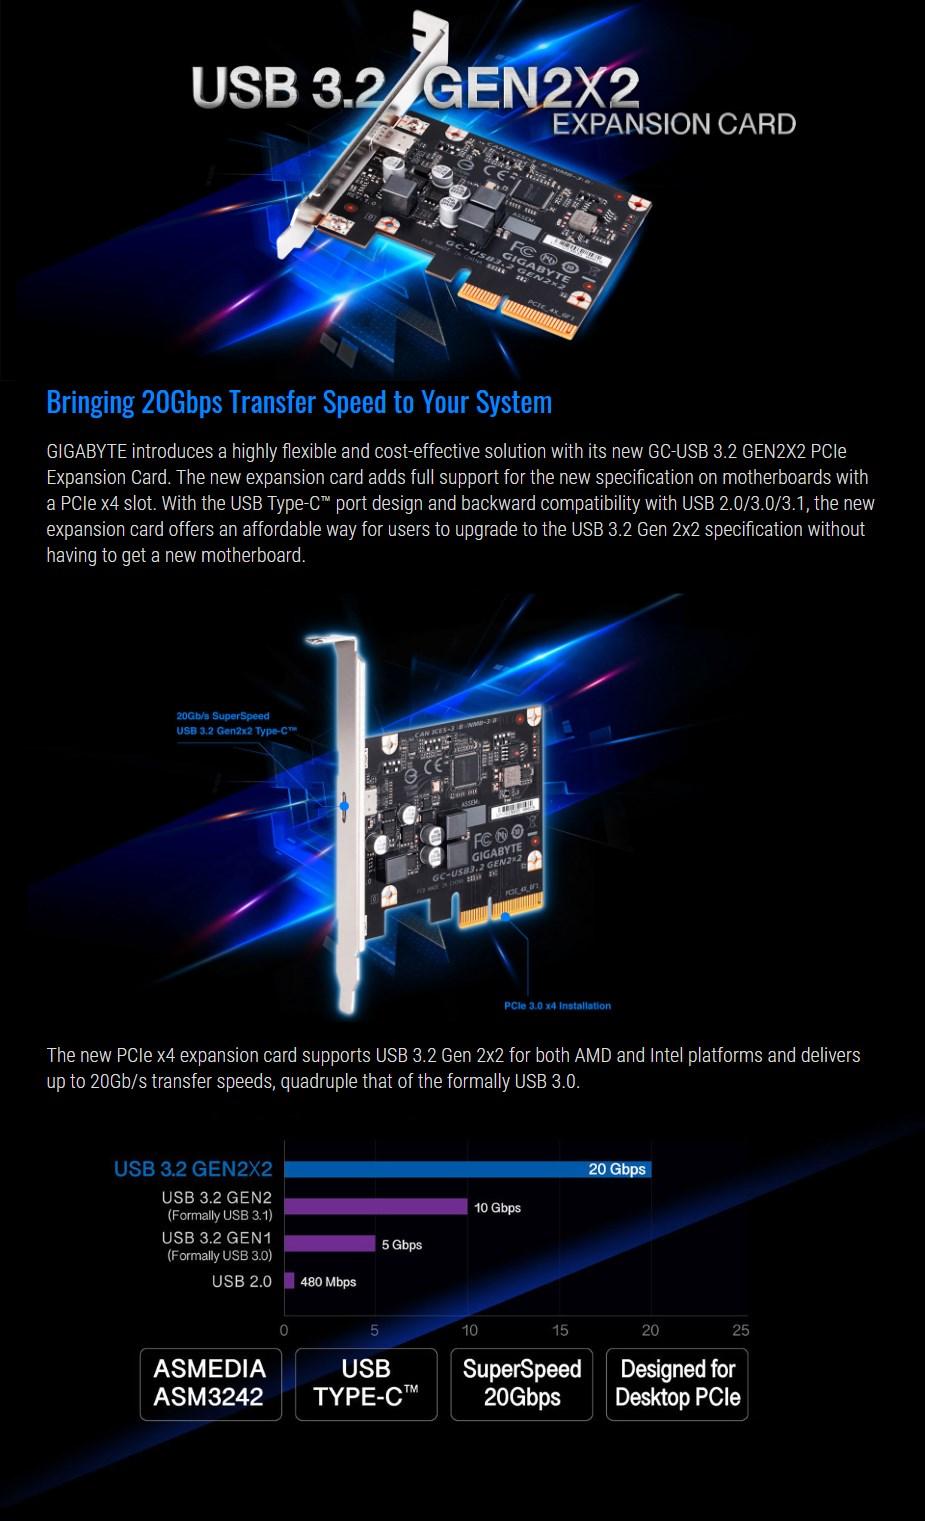 Gigabyte USB 3.2 Gen 2X2 PCIe Expansion Card - Overview 1